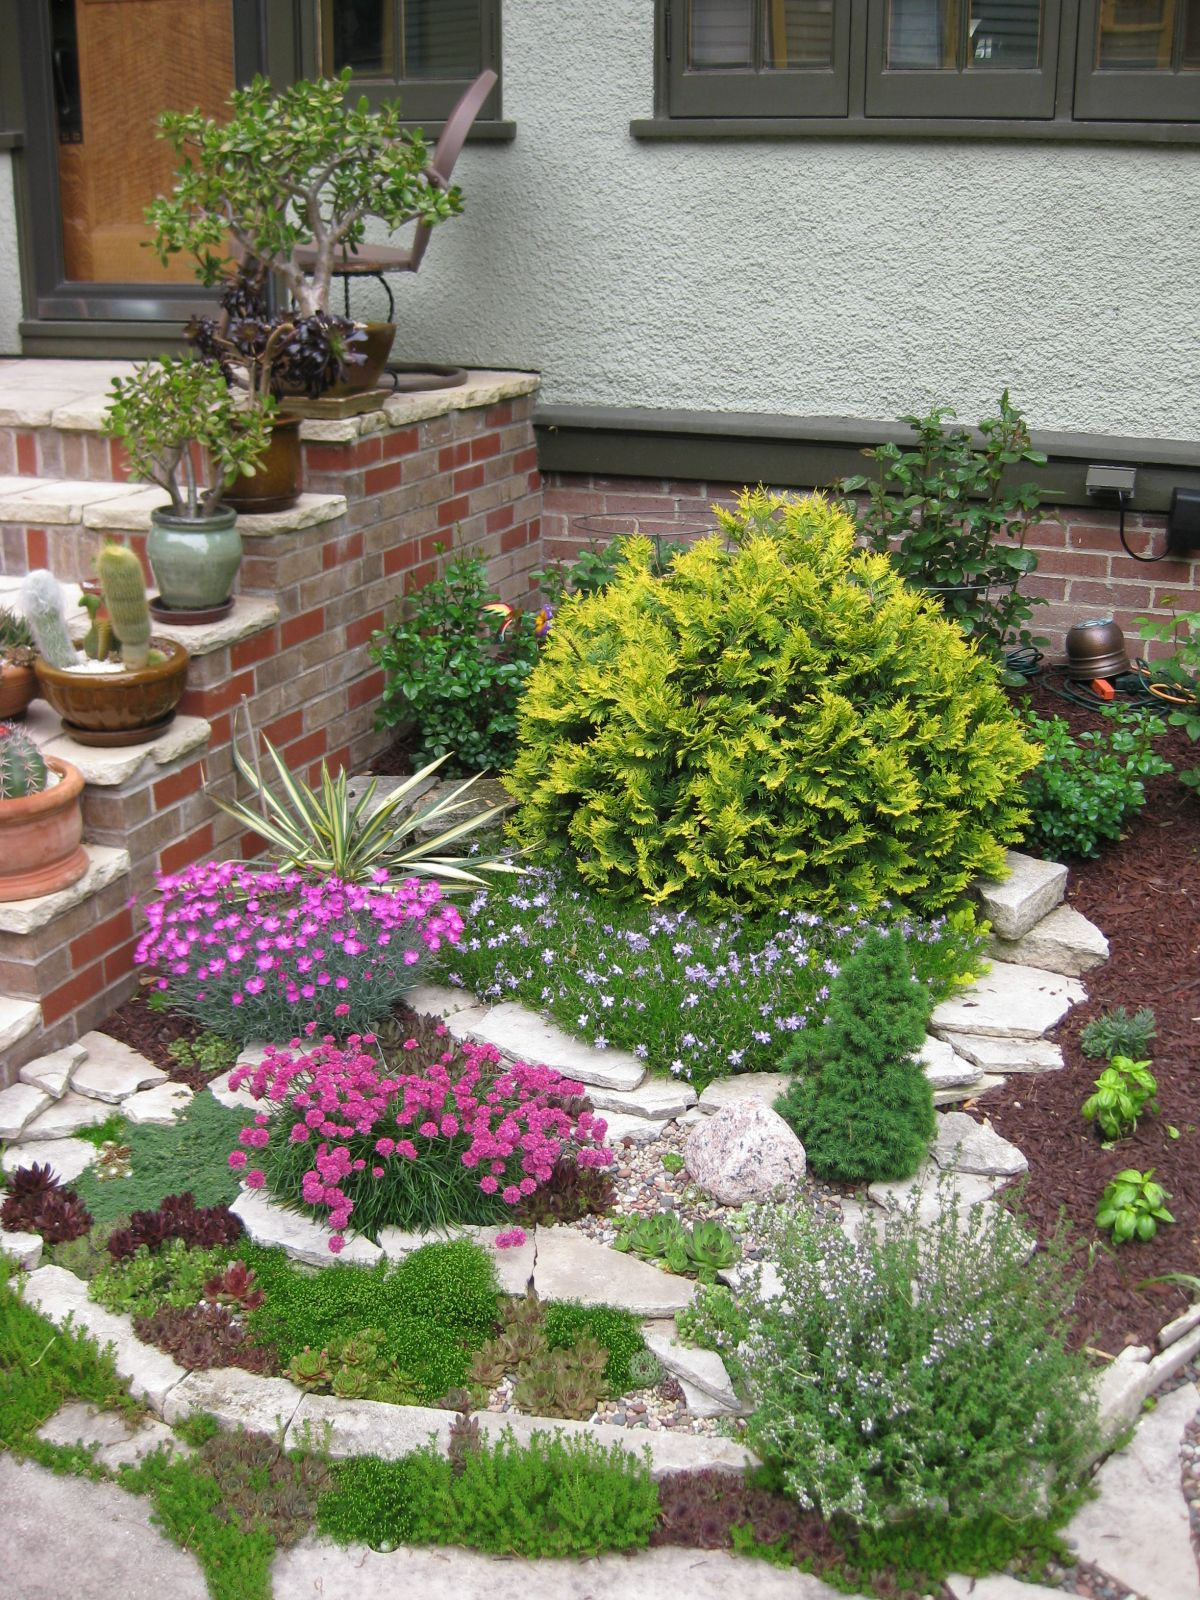 The Miniature Garden | Irish moss, Miniature gardens and Miniatures